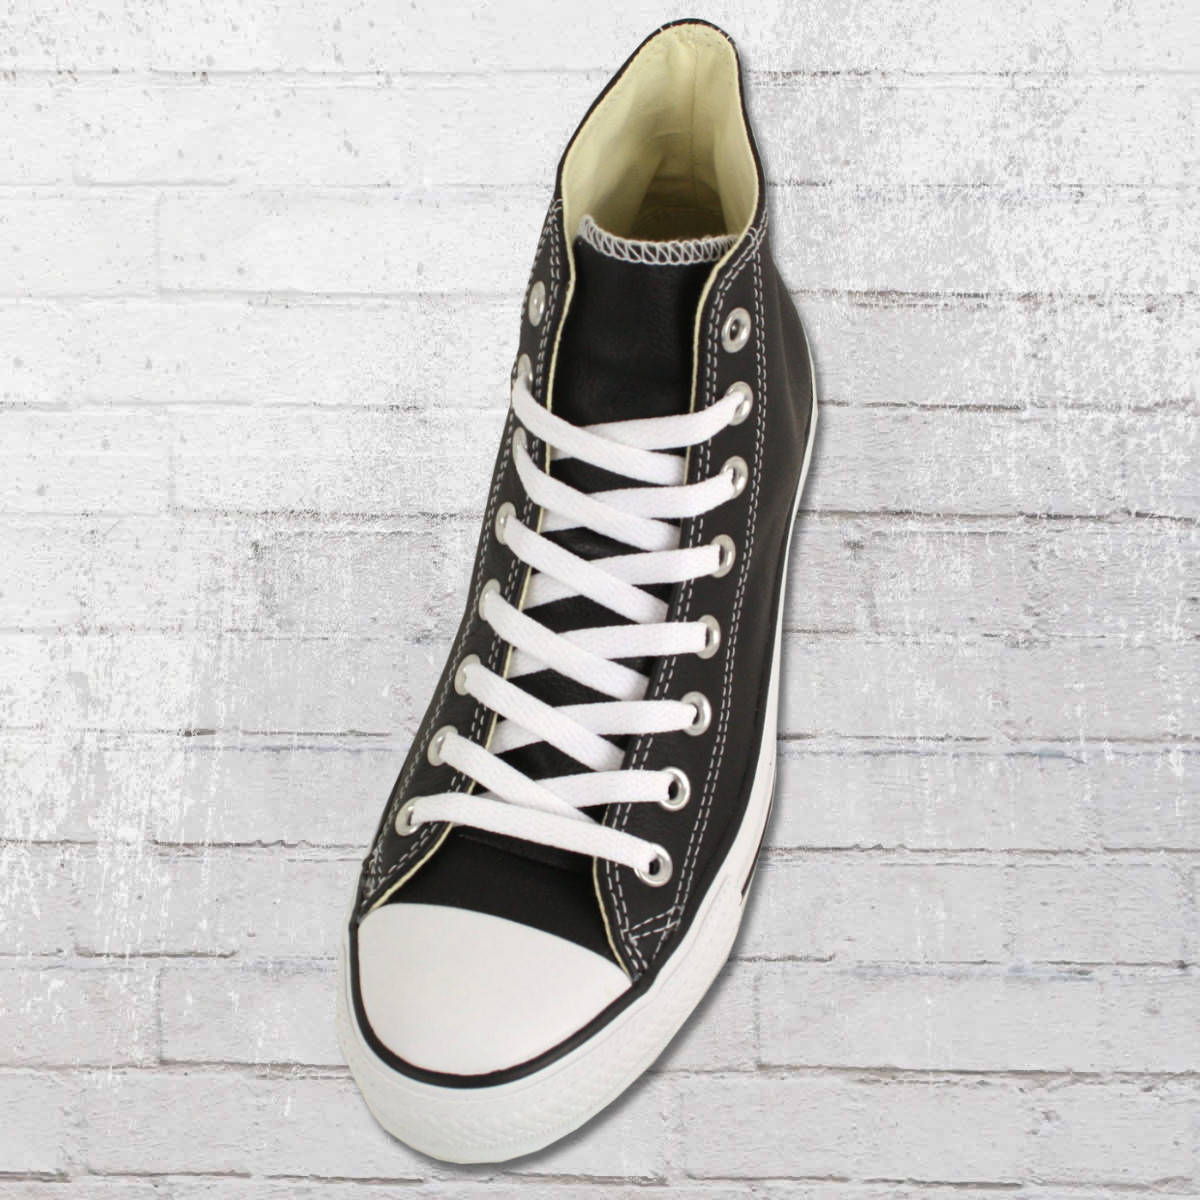 143c28871cbe Jetzt bestellen   Converse Chucks Leder Schuhe Unisex 132170 C ...